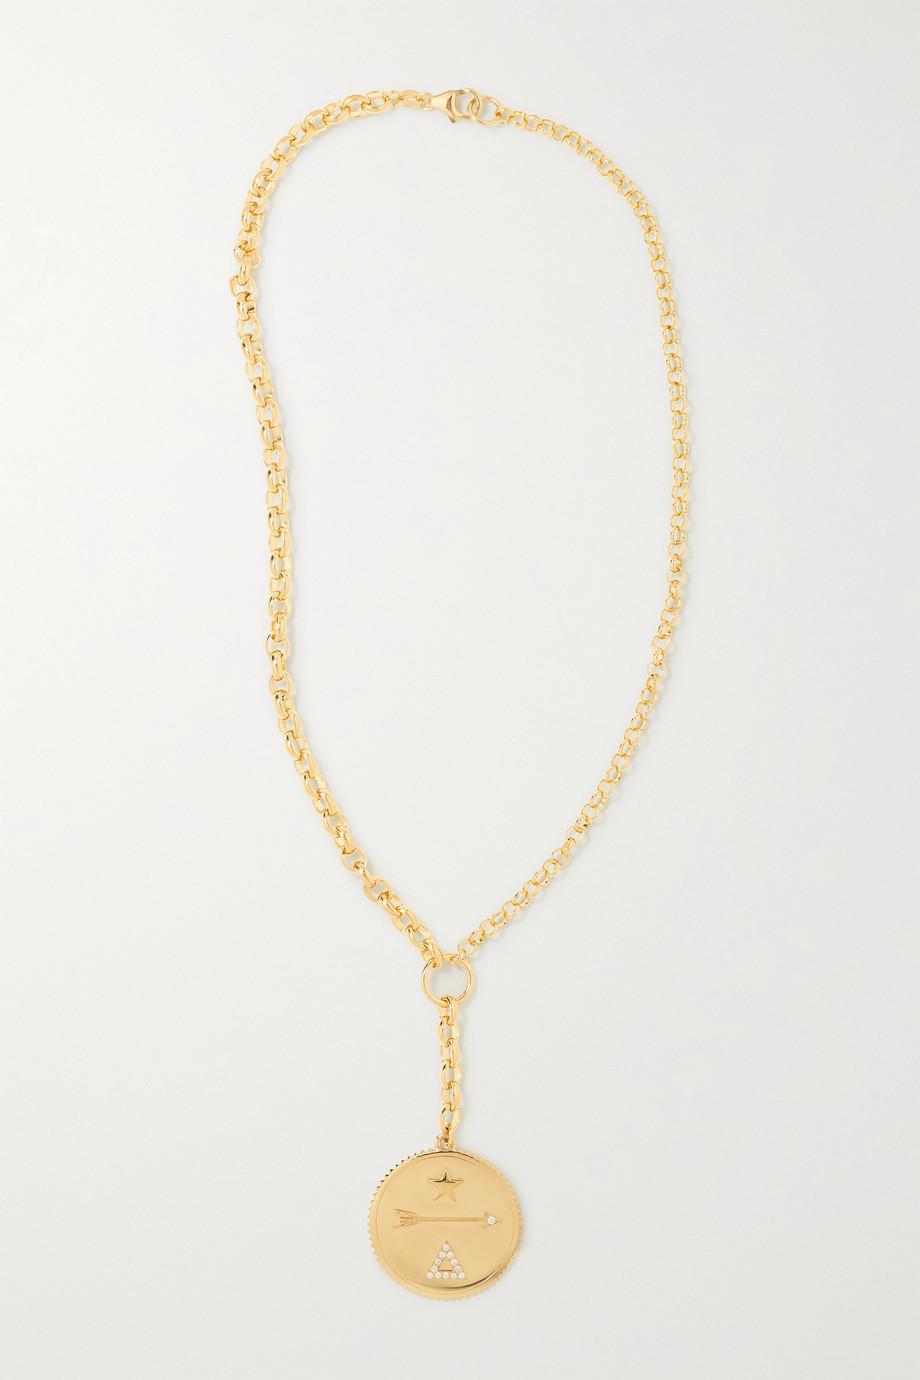 Foundrae + NET SUSTAIN Dream 18-karat recycled gold diamond necklace